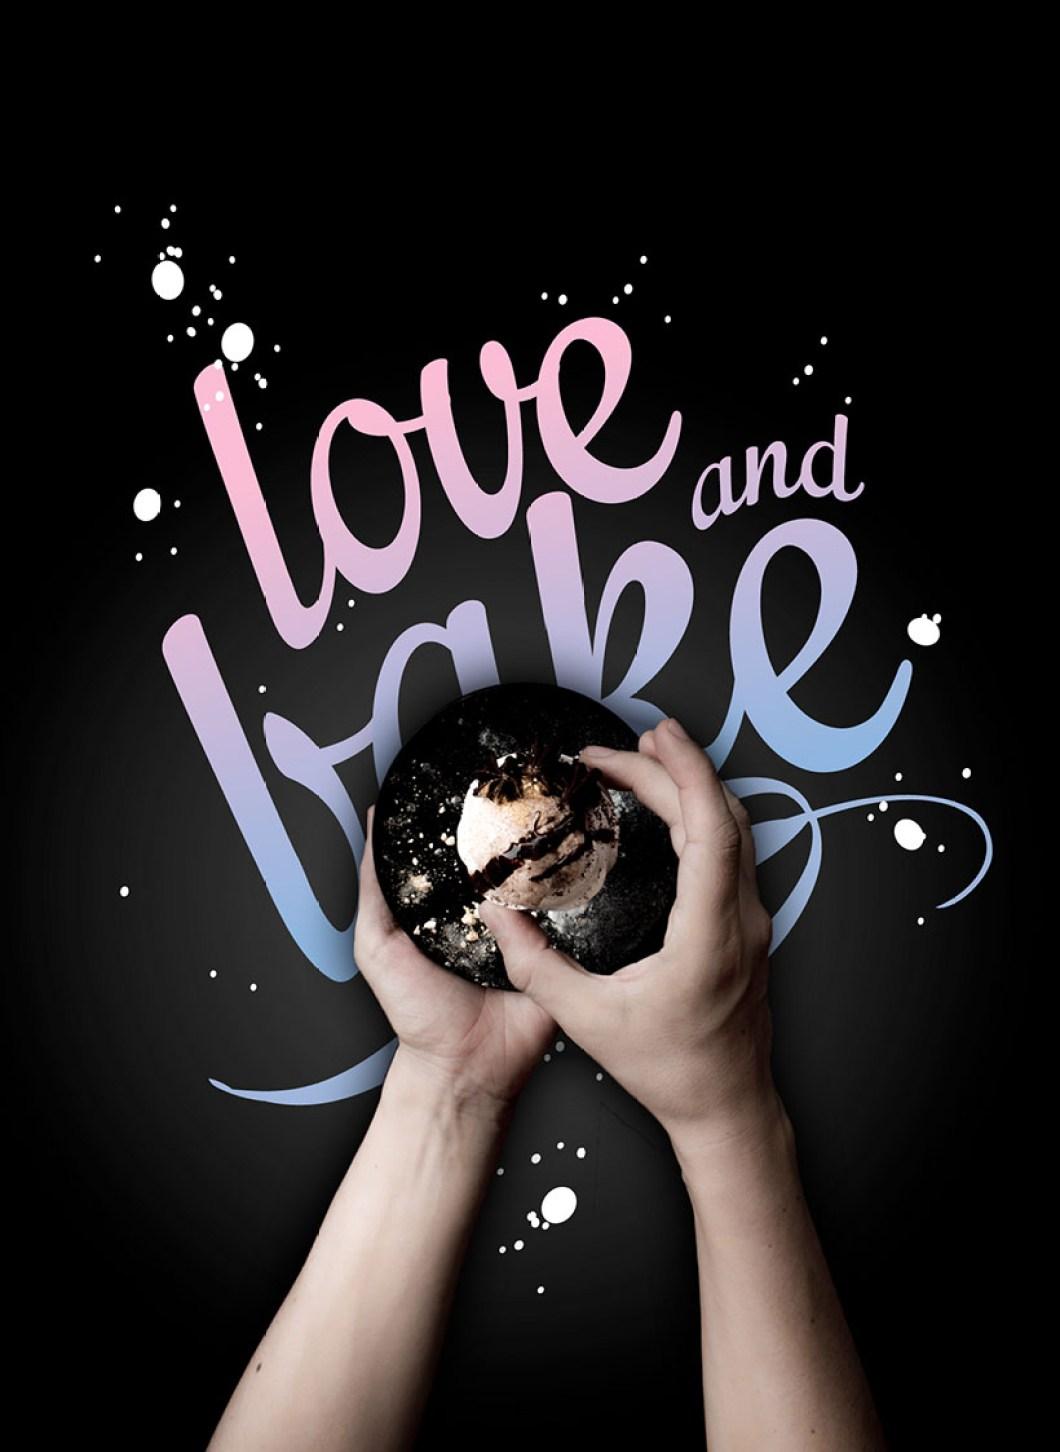 LOVE AND BAKE